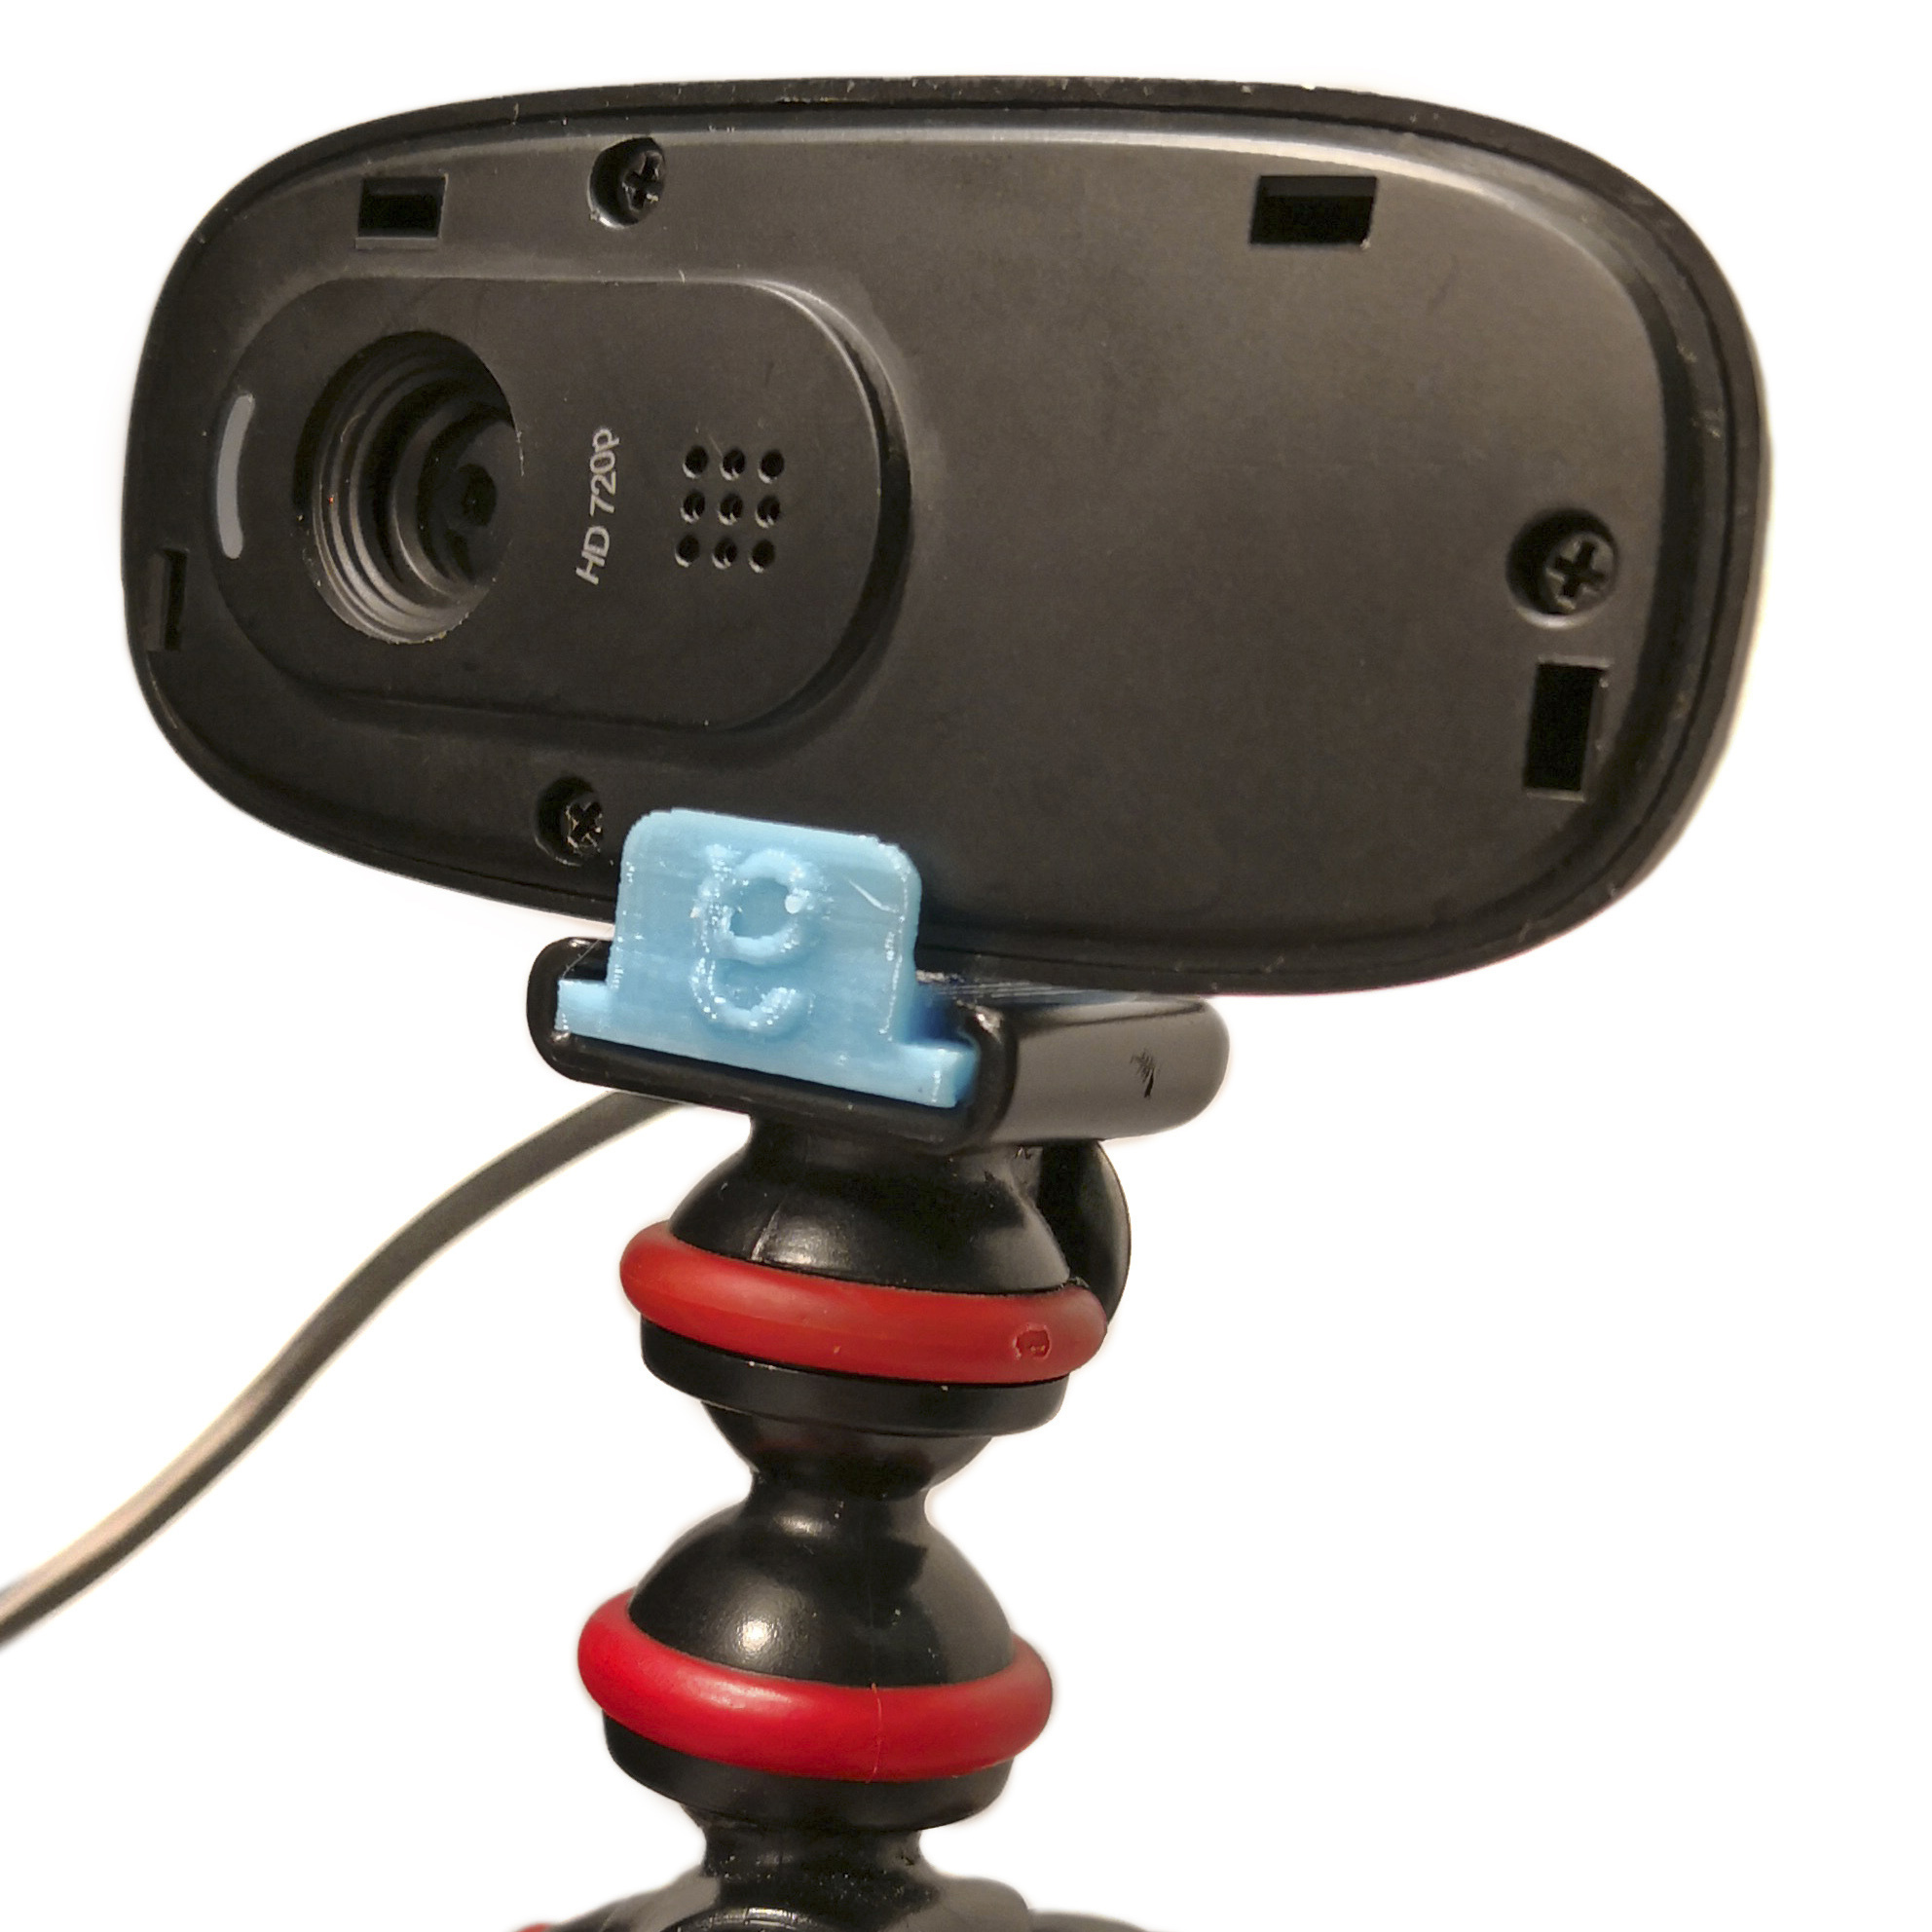 3d Printed Logitech C270 Webcam Guerrilla Tripod Mount By Edditive Pinshape